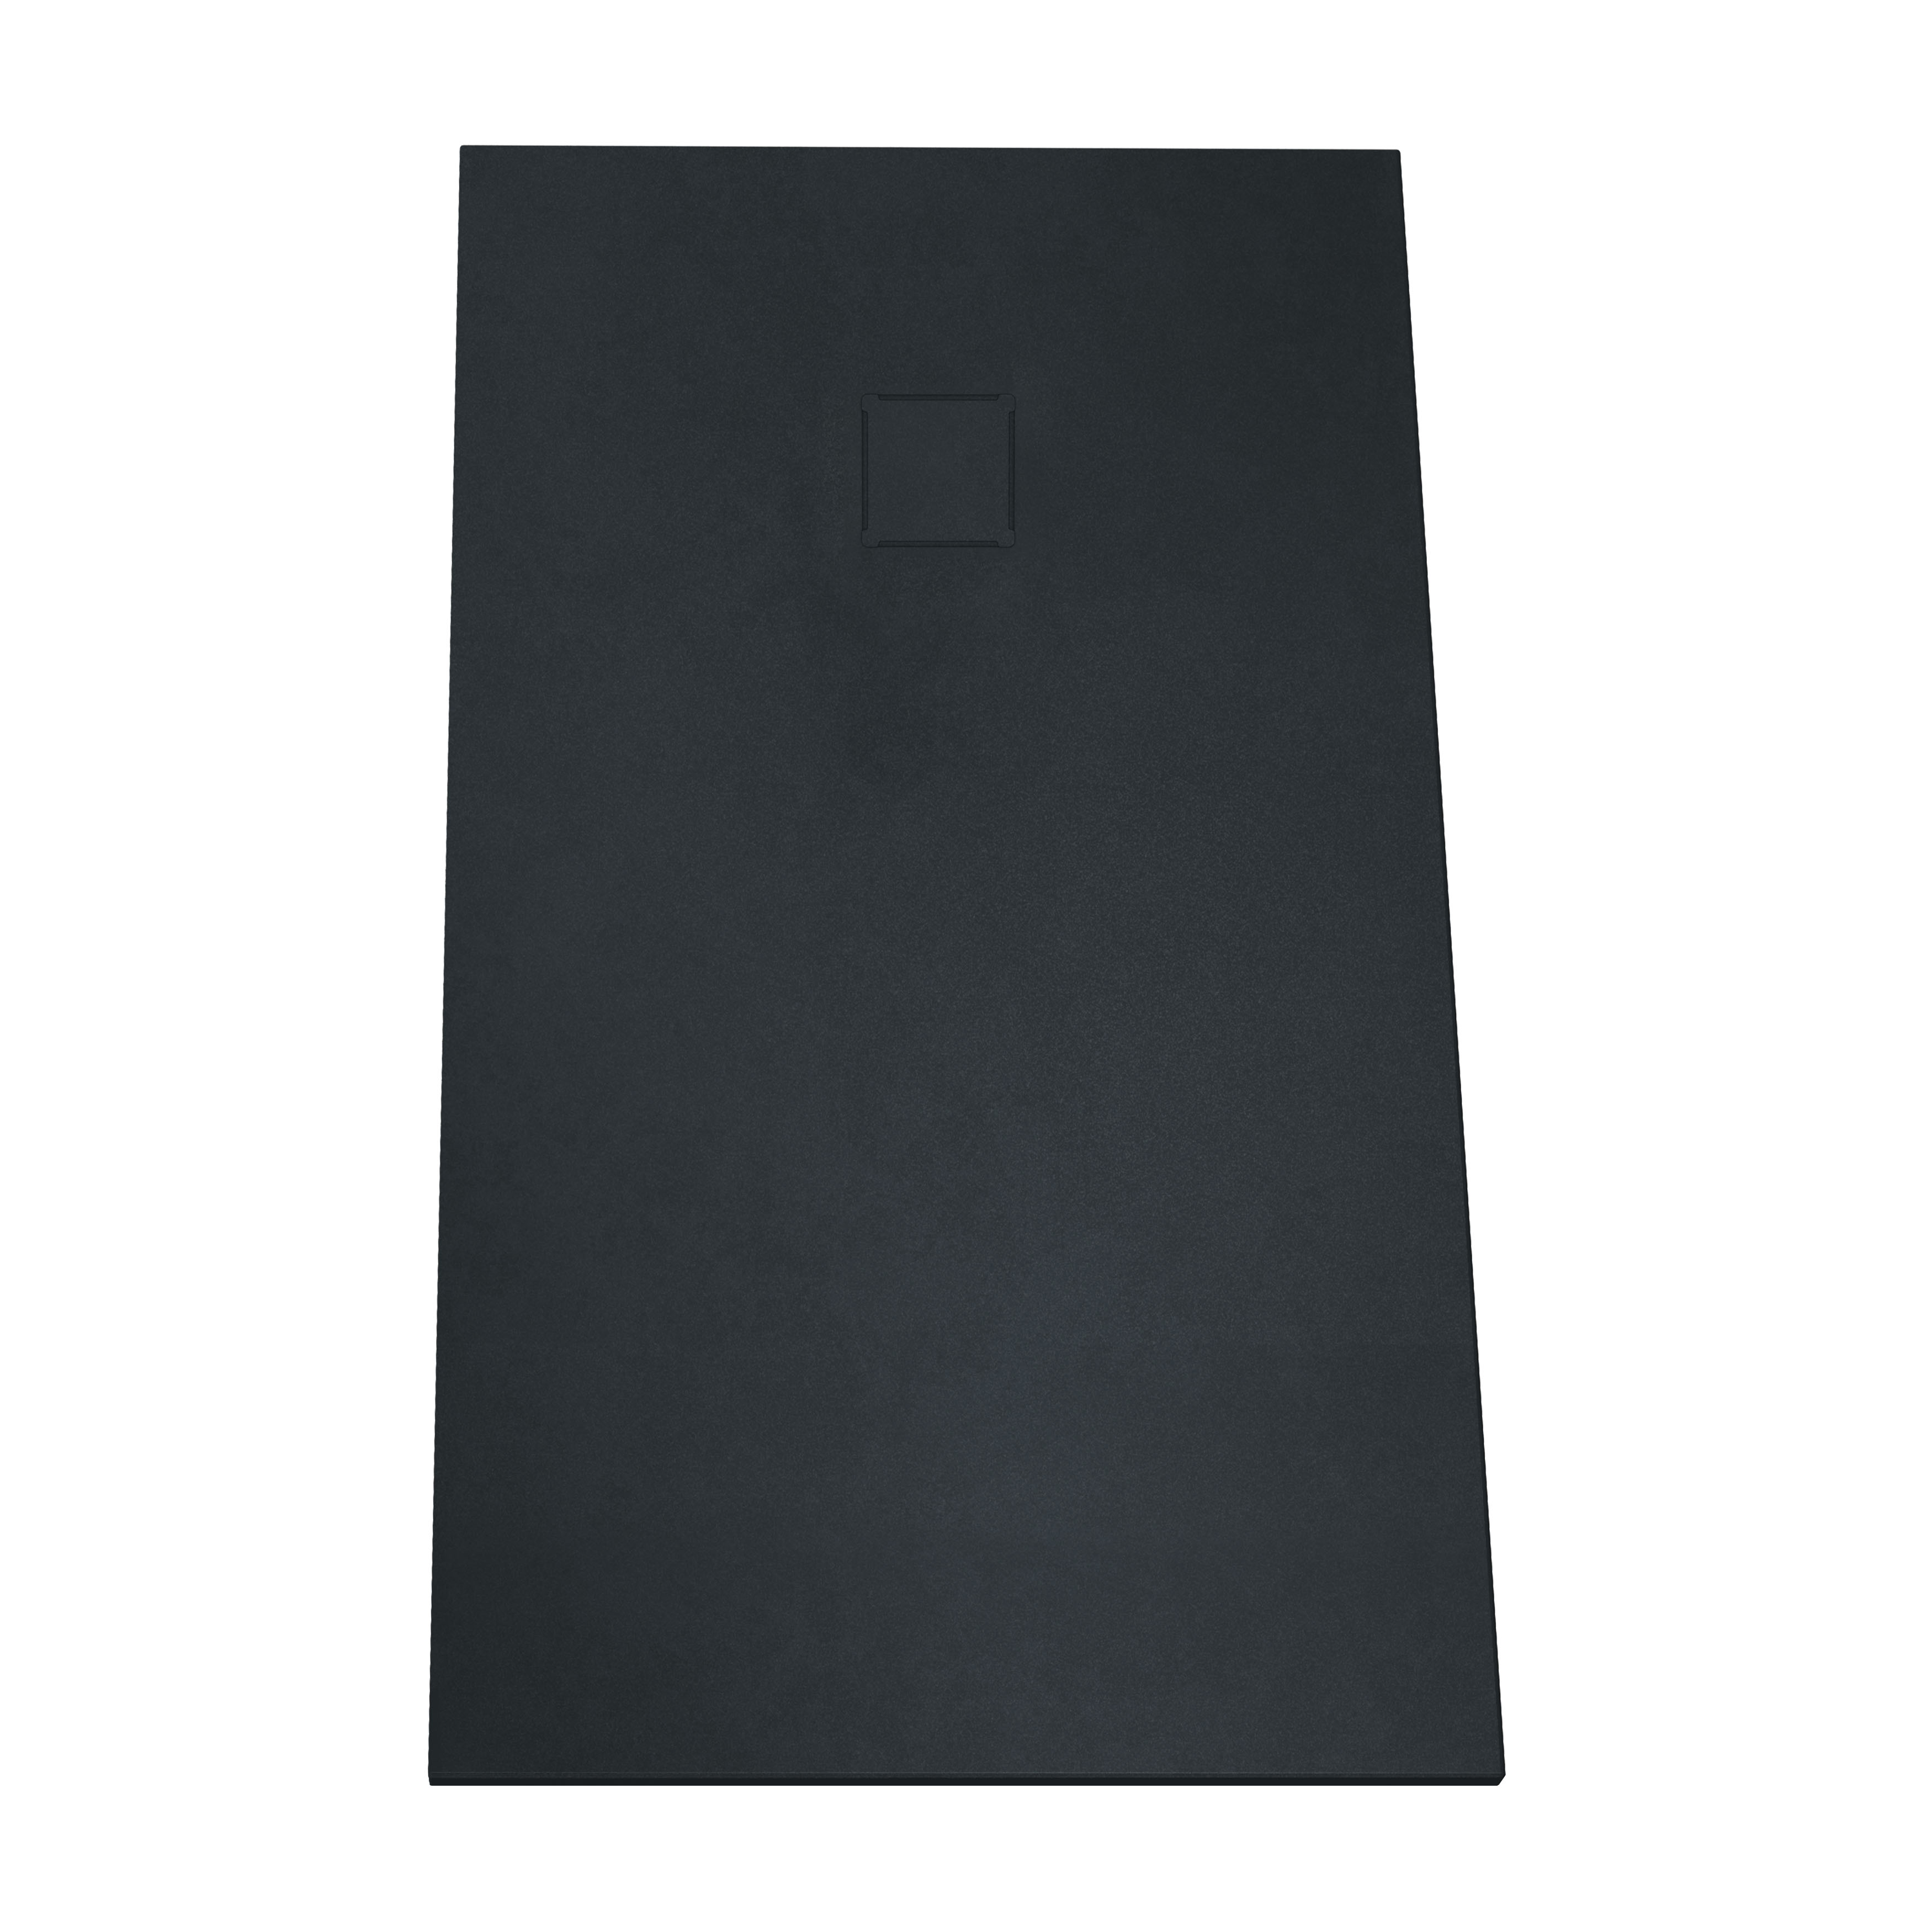 V-stone, receveur ultra plat en solid stone, 140  x  80 cm, anthraciteacite